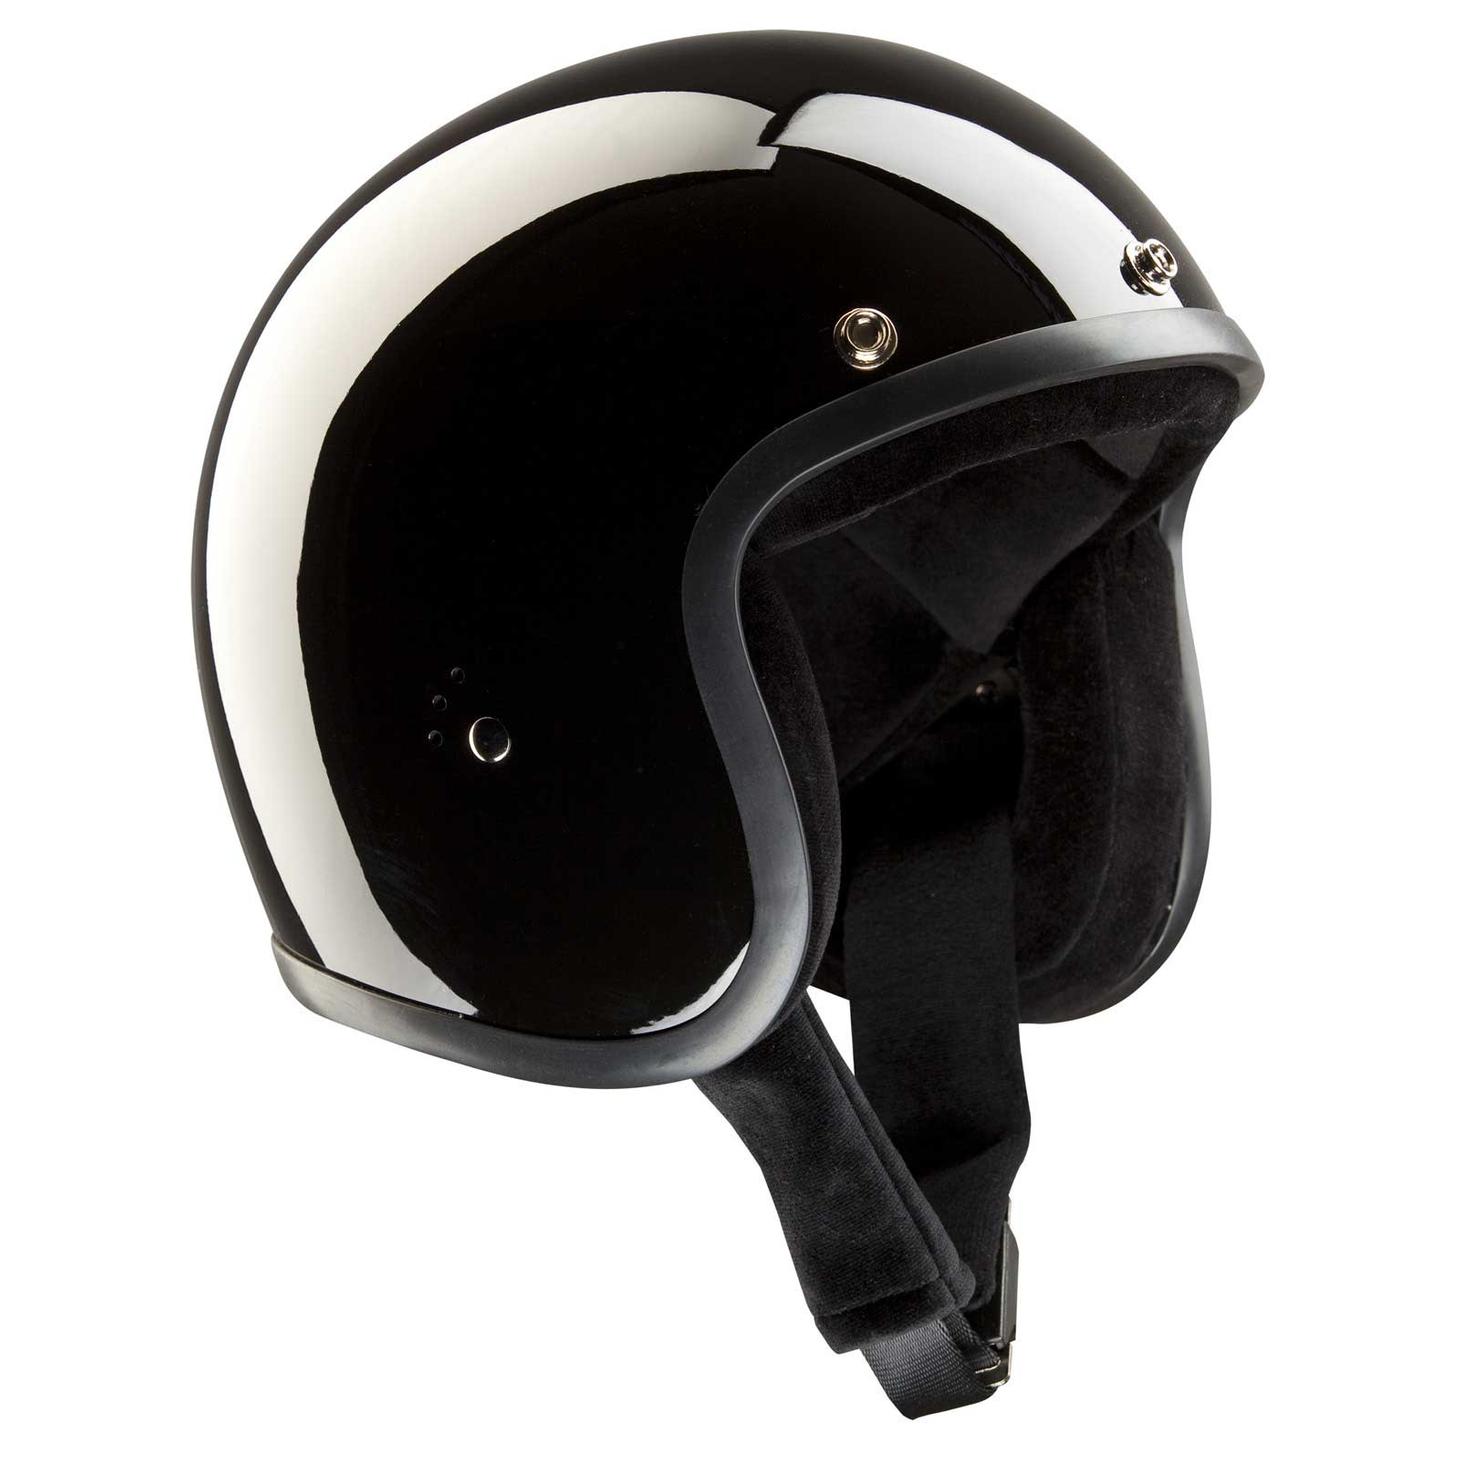 Bandit Jet Helmet - Glossy Black Motorcycle Open Face Helmet – Picture 3